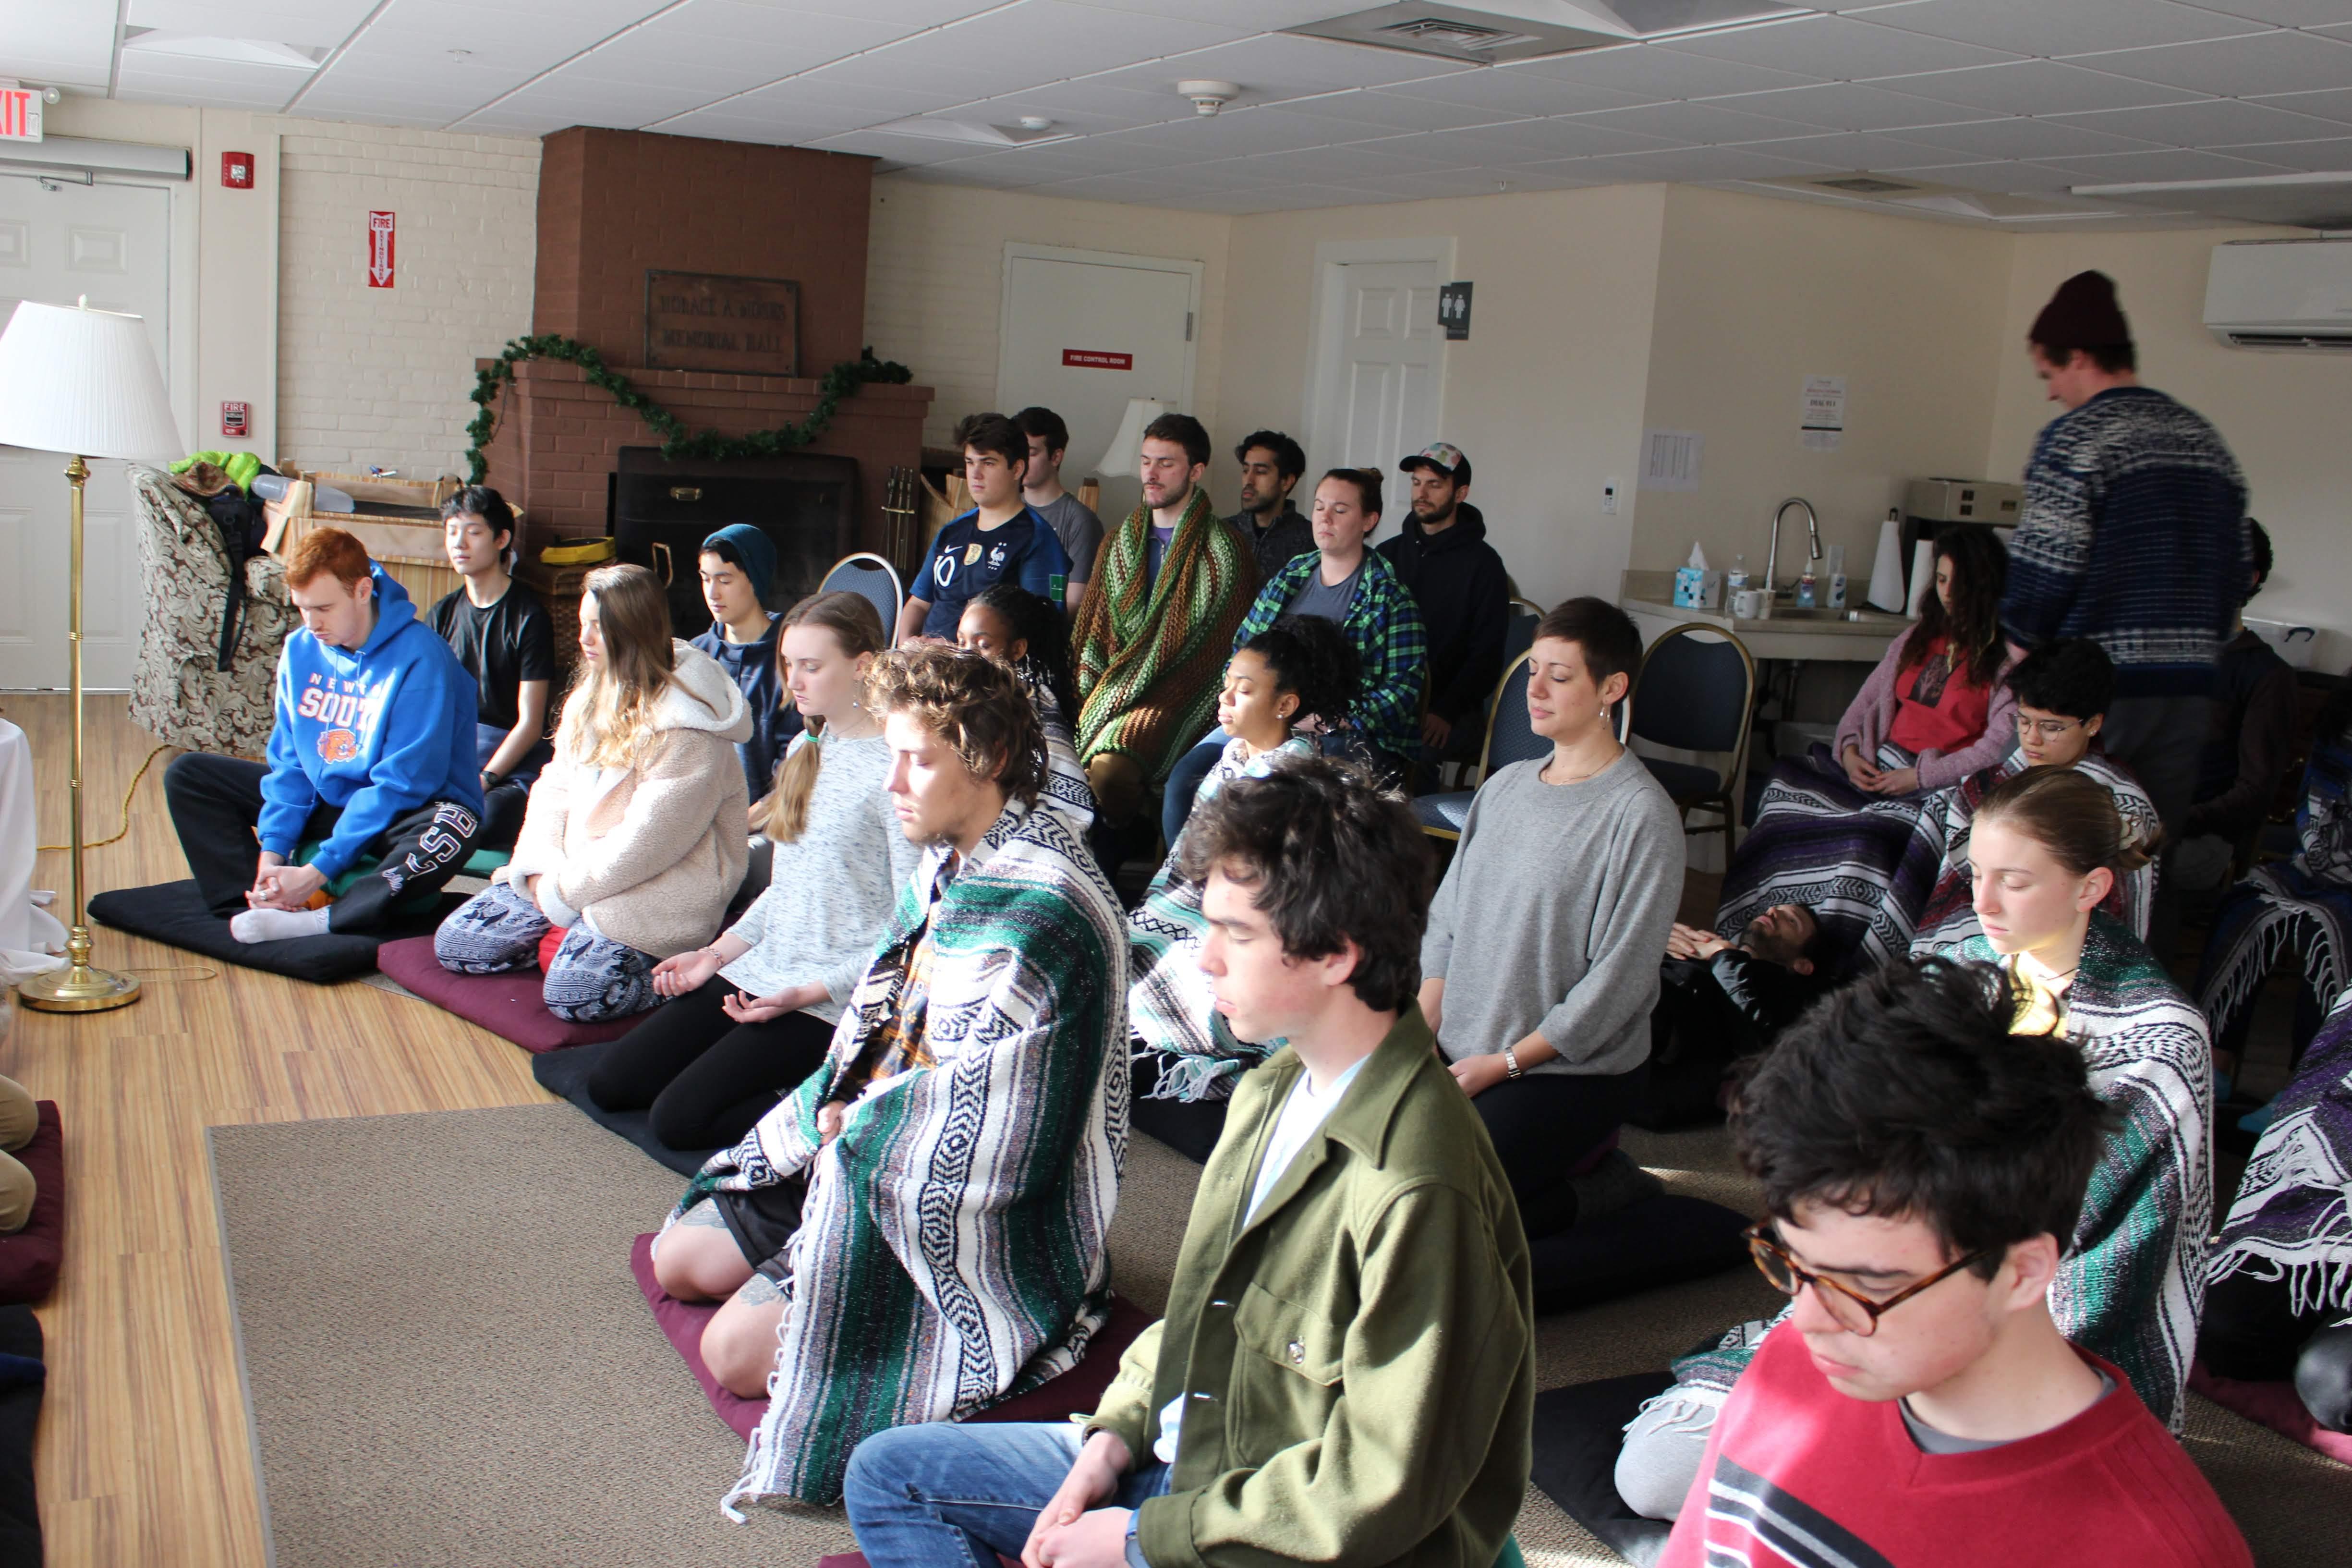 Summer Program - Meditation   iBme: Mindfulness Retreats for Teens